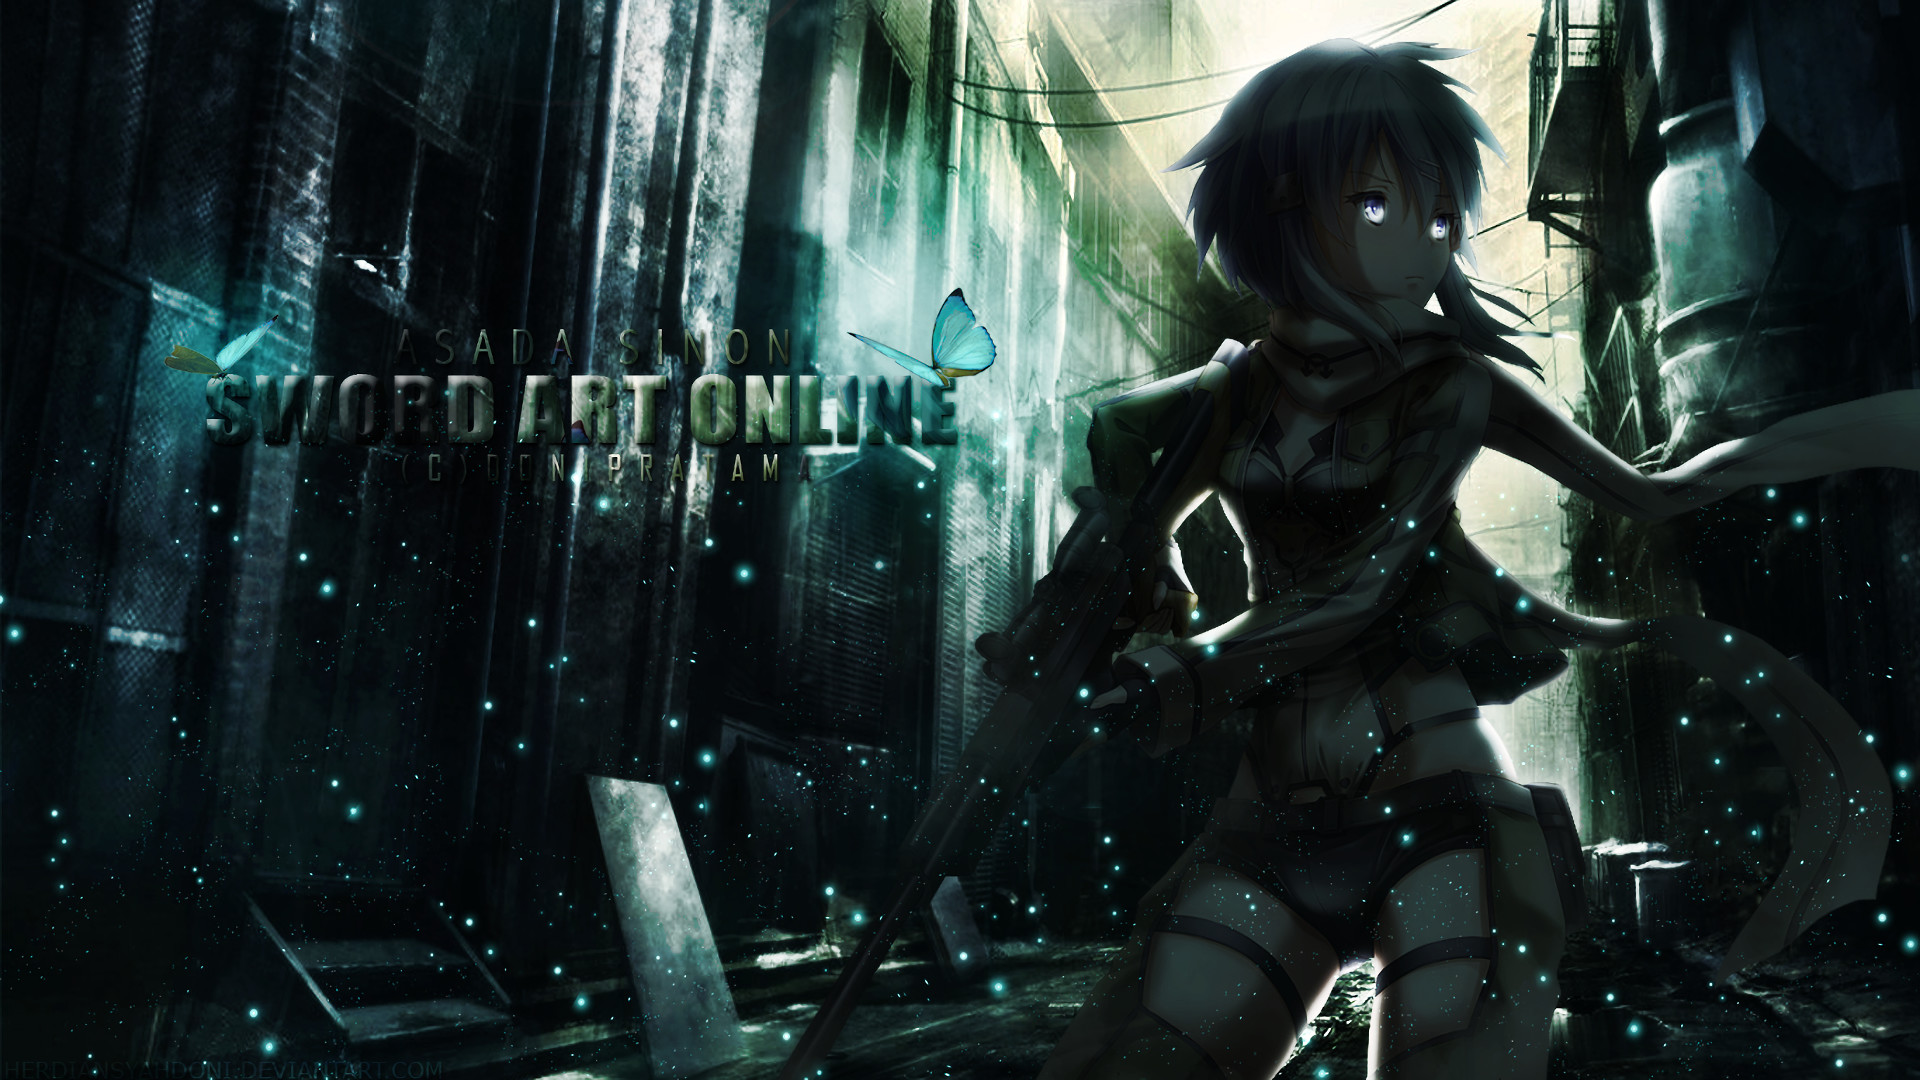 Anime – Sword Art Online II Sinon (Sword Art Online) Asada Shino Wallpaper